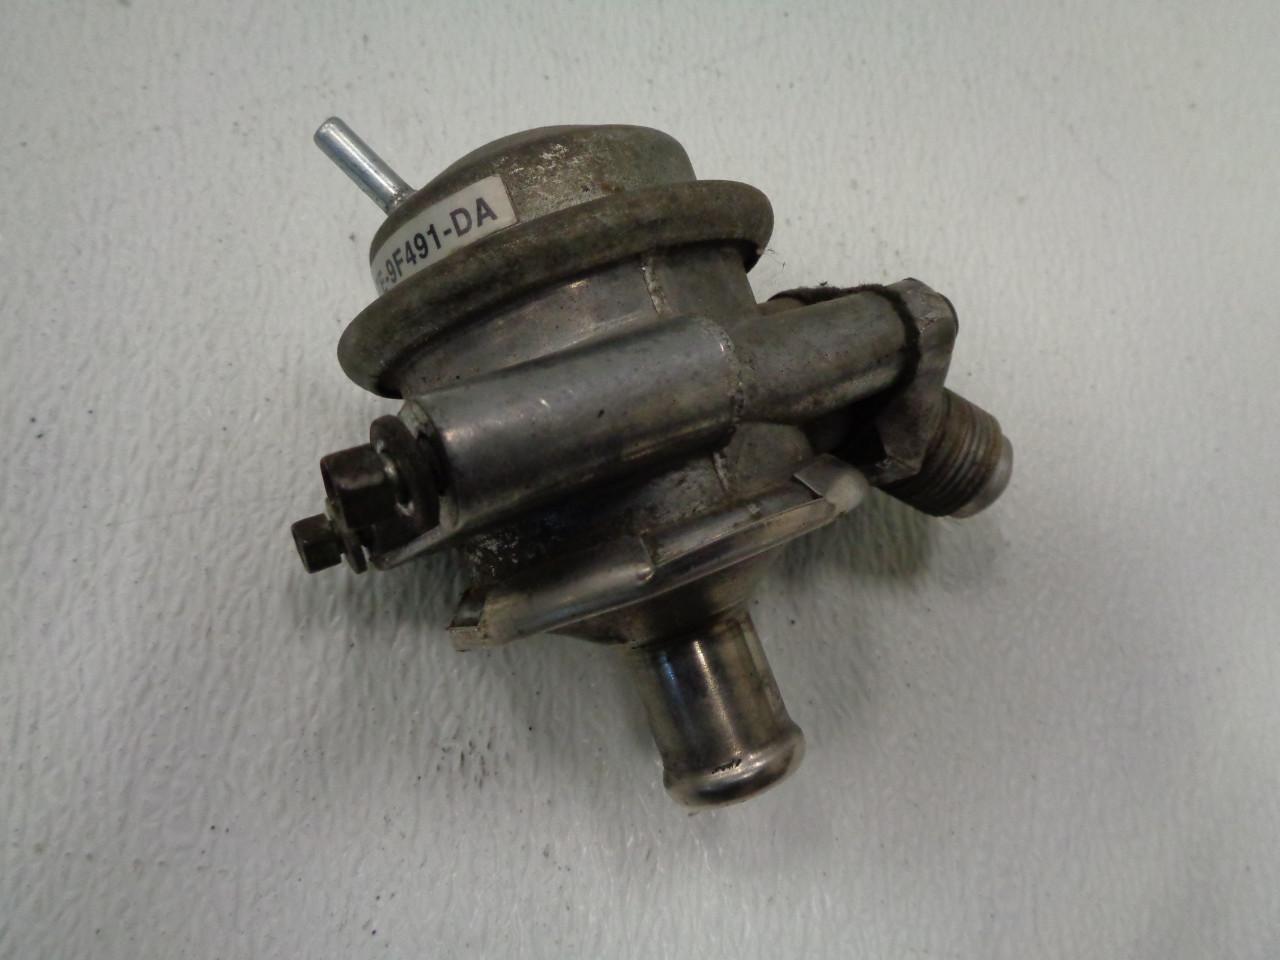 1996 Ford Mustang Smog Air Management Diverter Bypass Valve Vacuum Cobra Dohc 4 6 F6ze